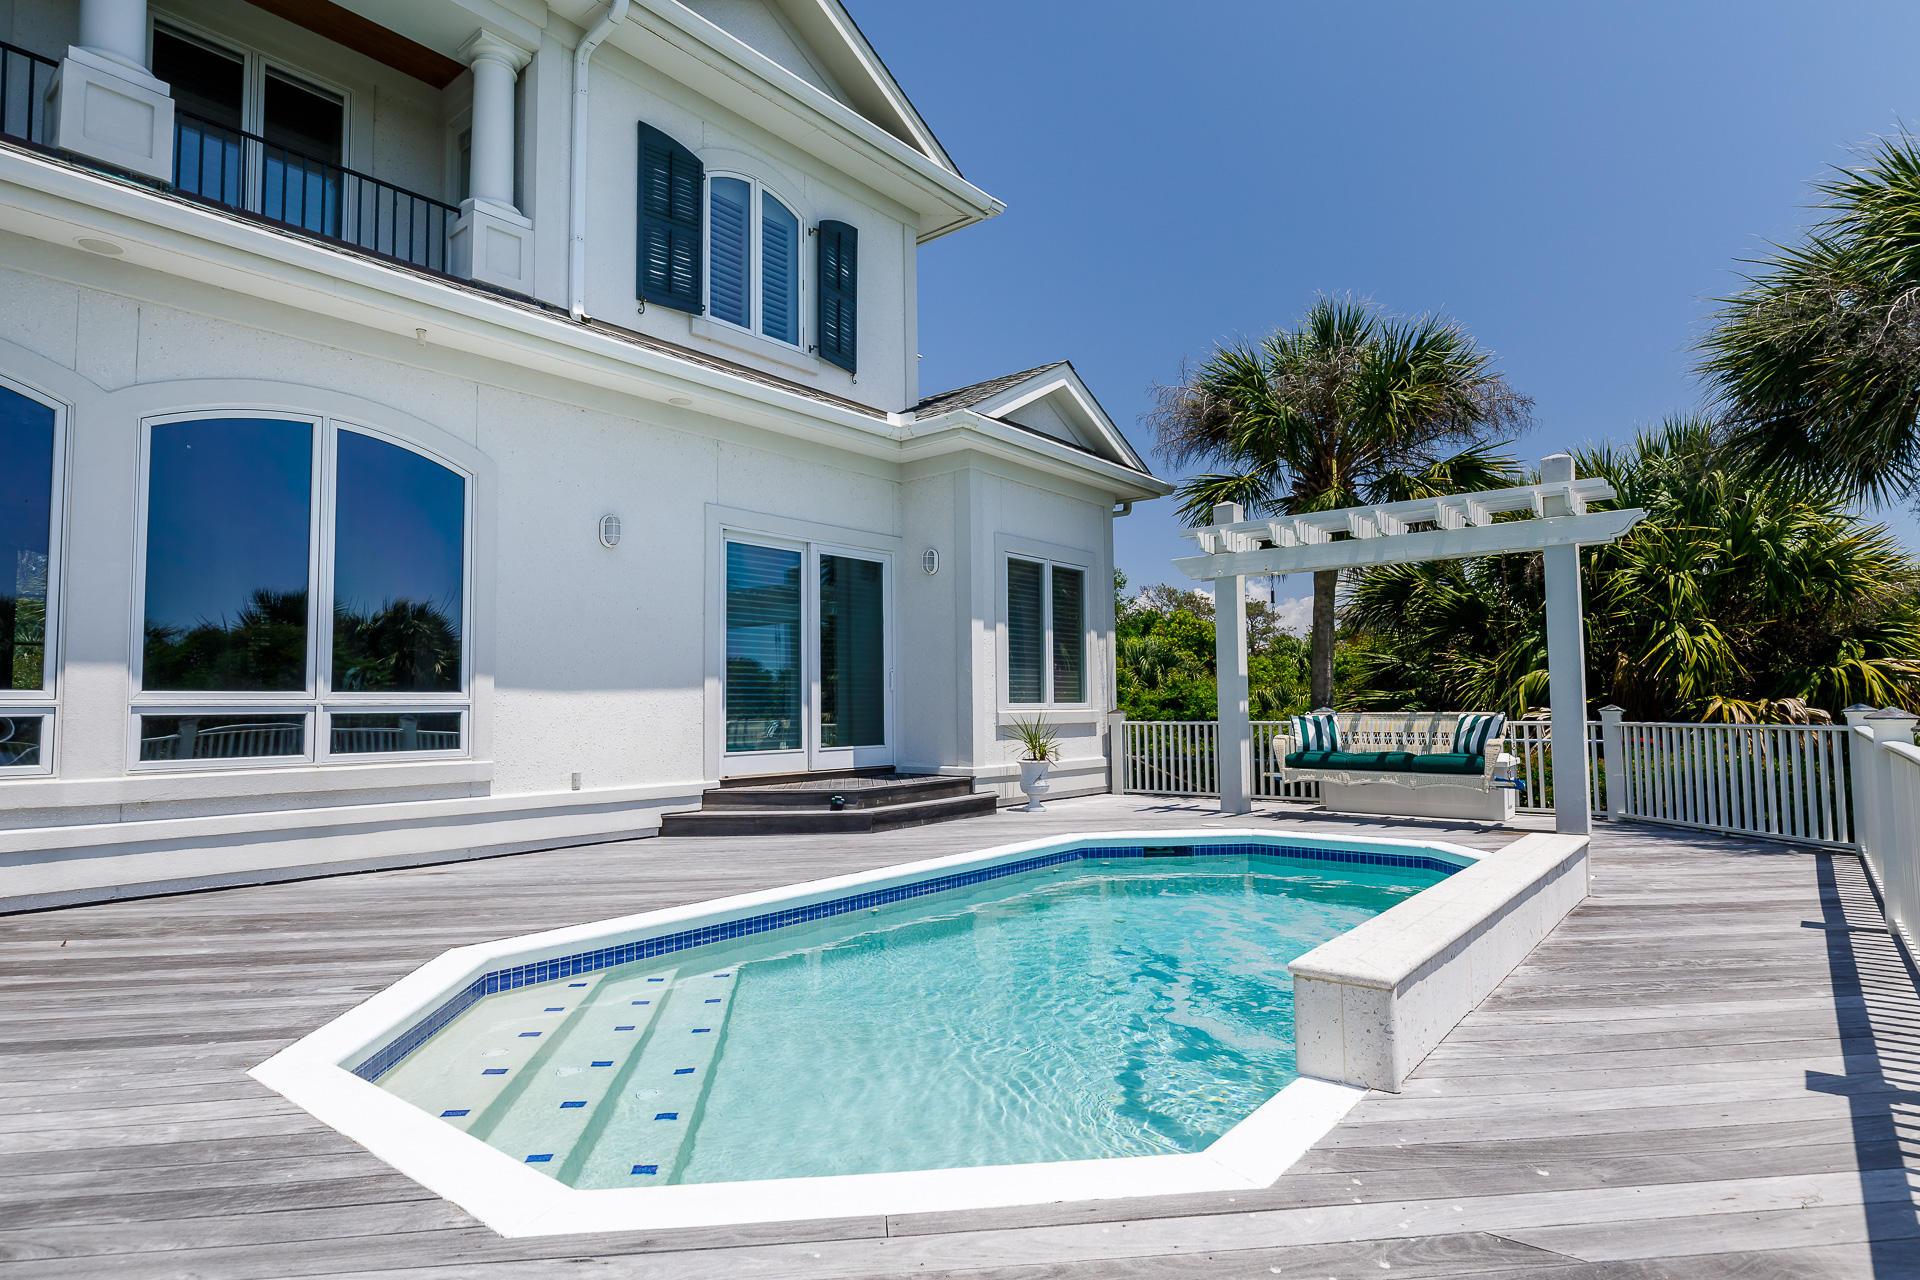 Seabrook Island Homes For Sale - 2216 Rolling Dune, Seabrook Island, SC - 53